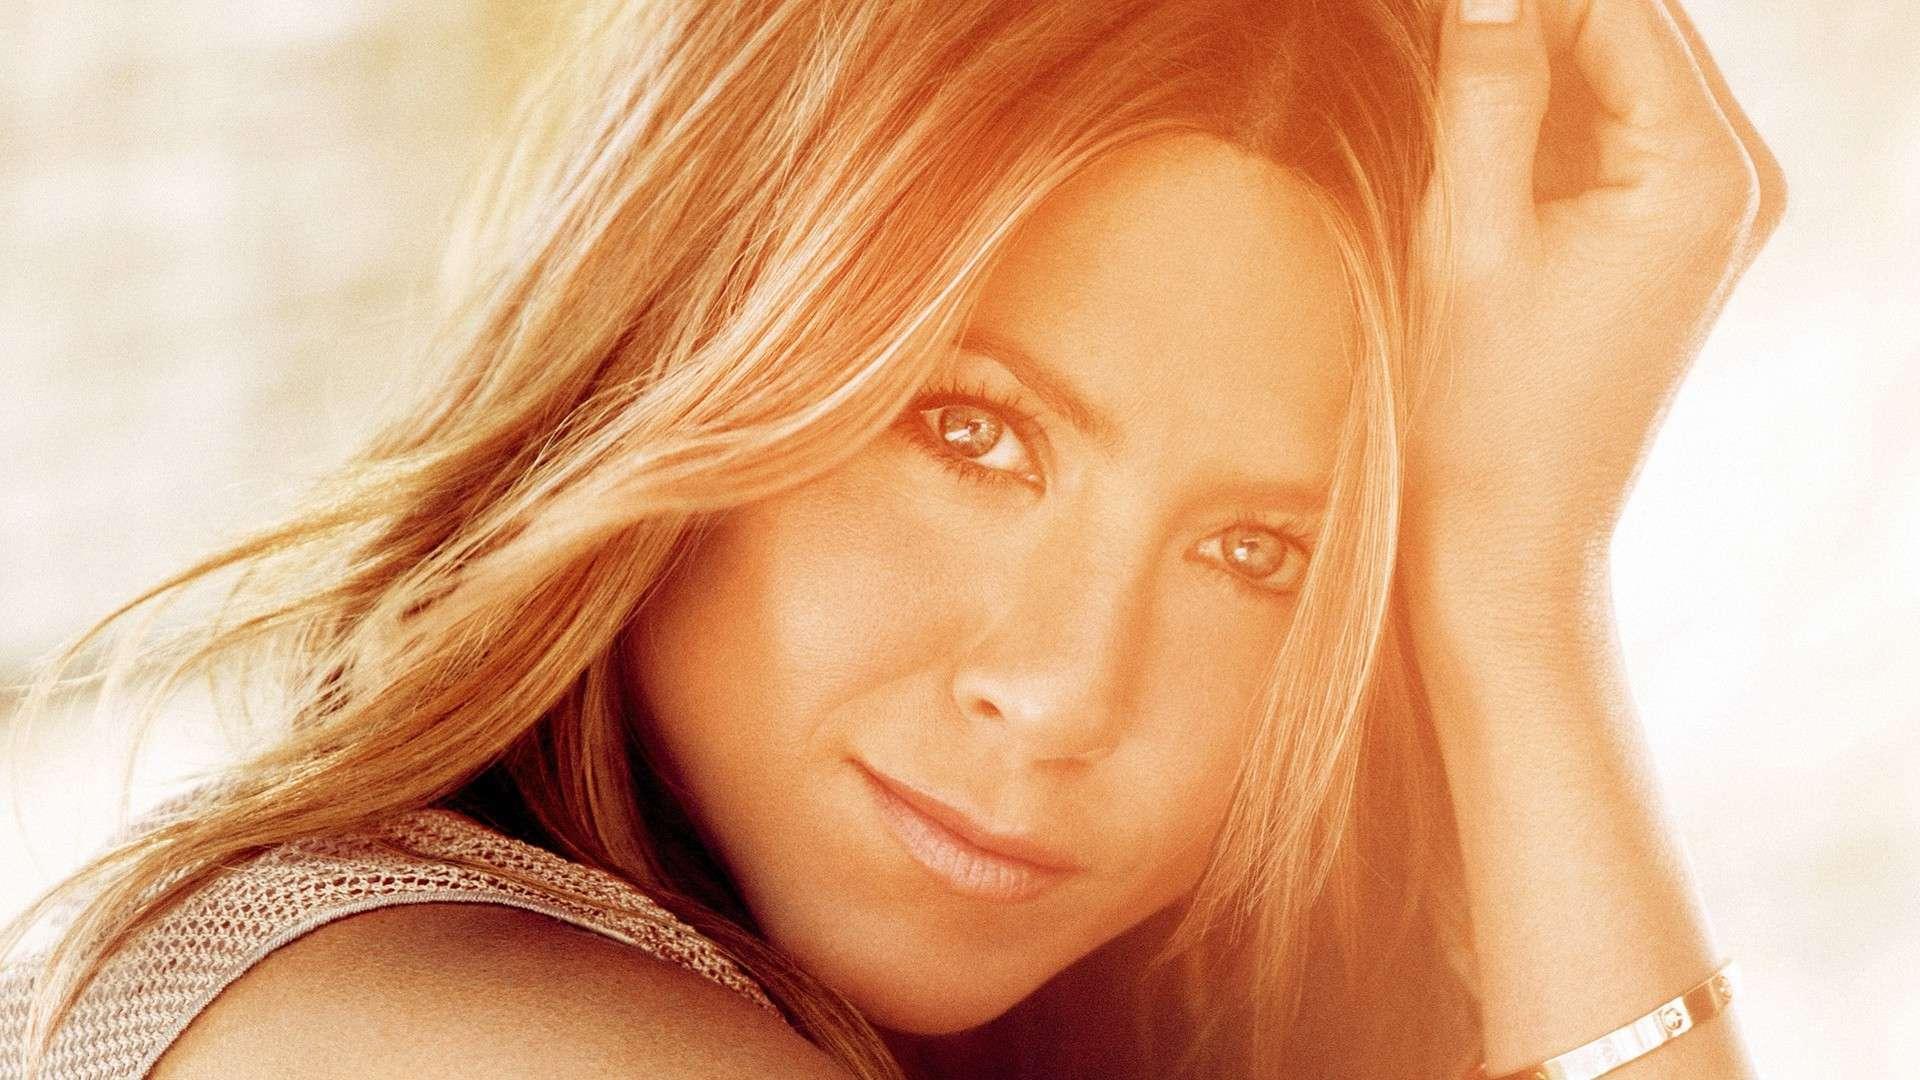 Jennifer Aniston Background